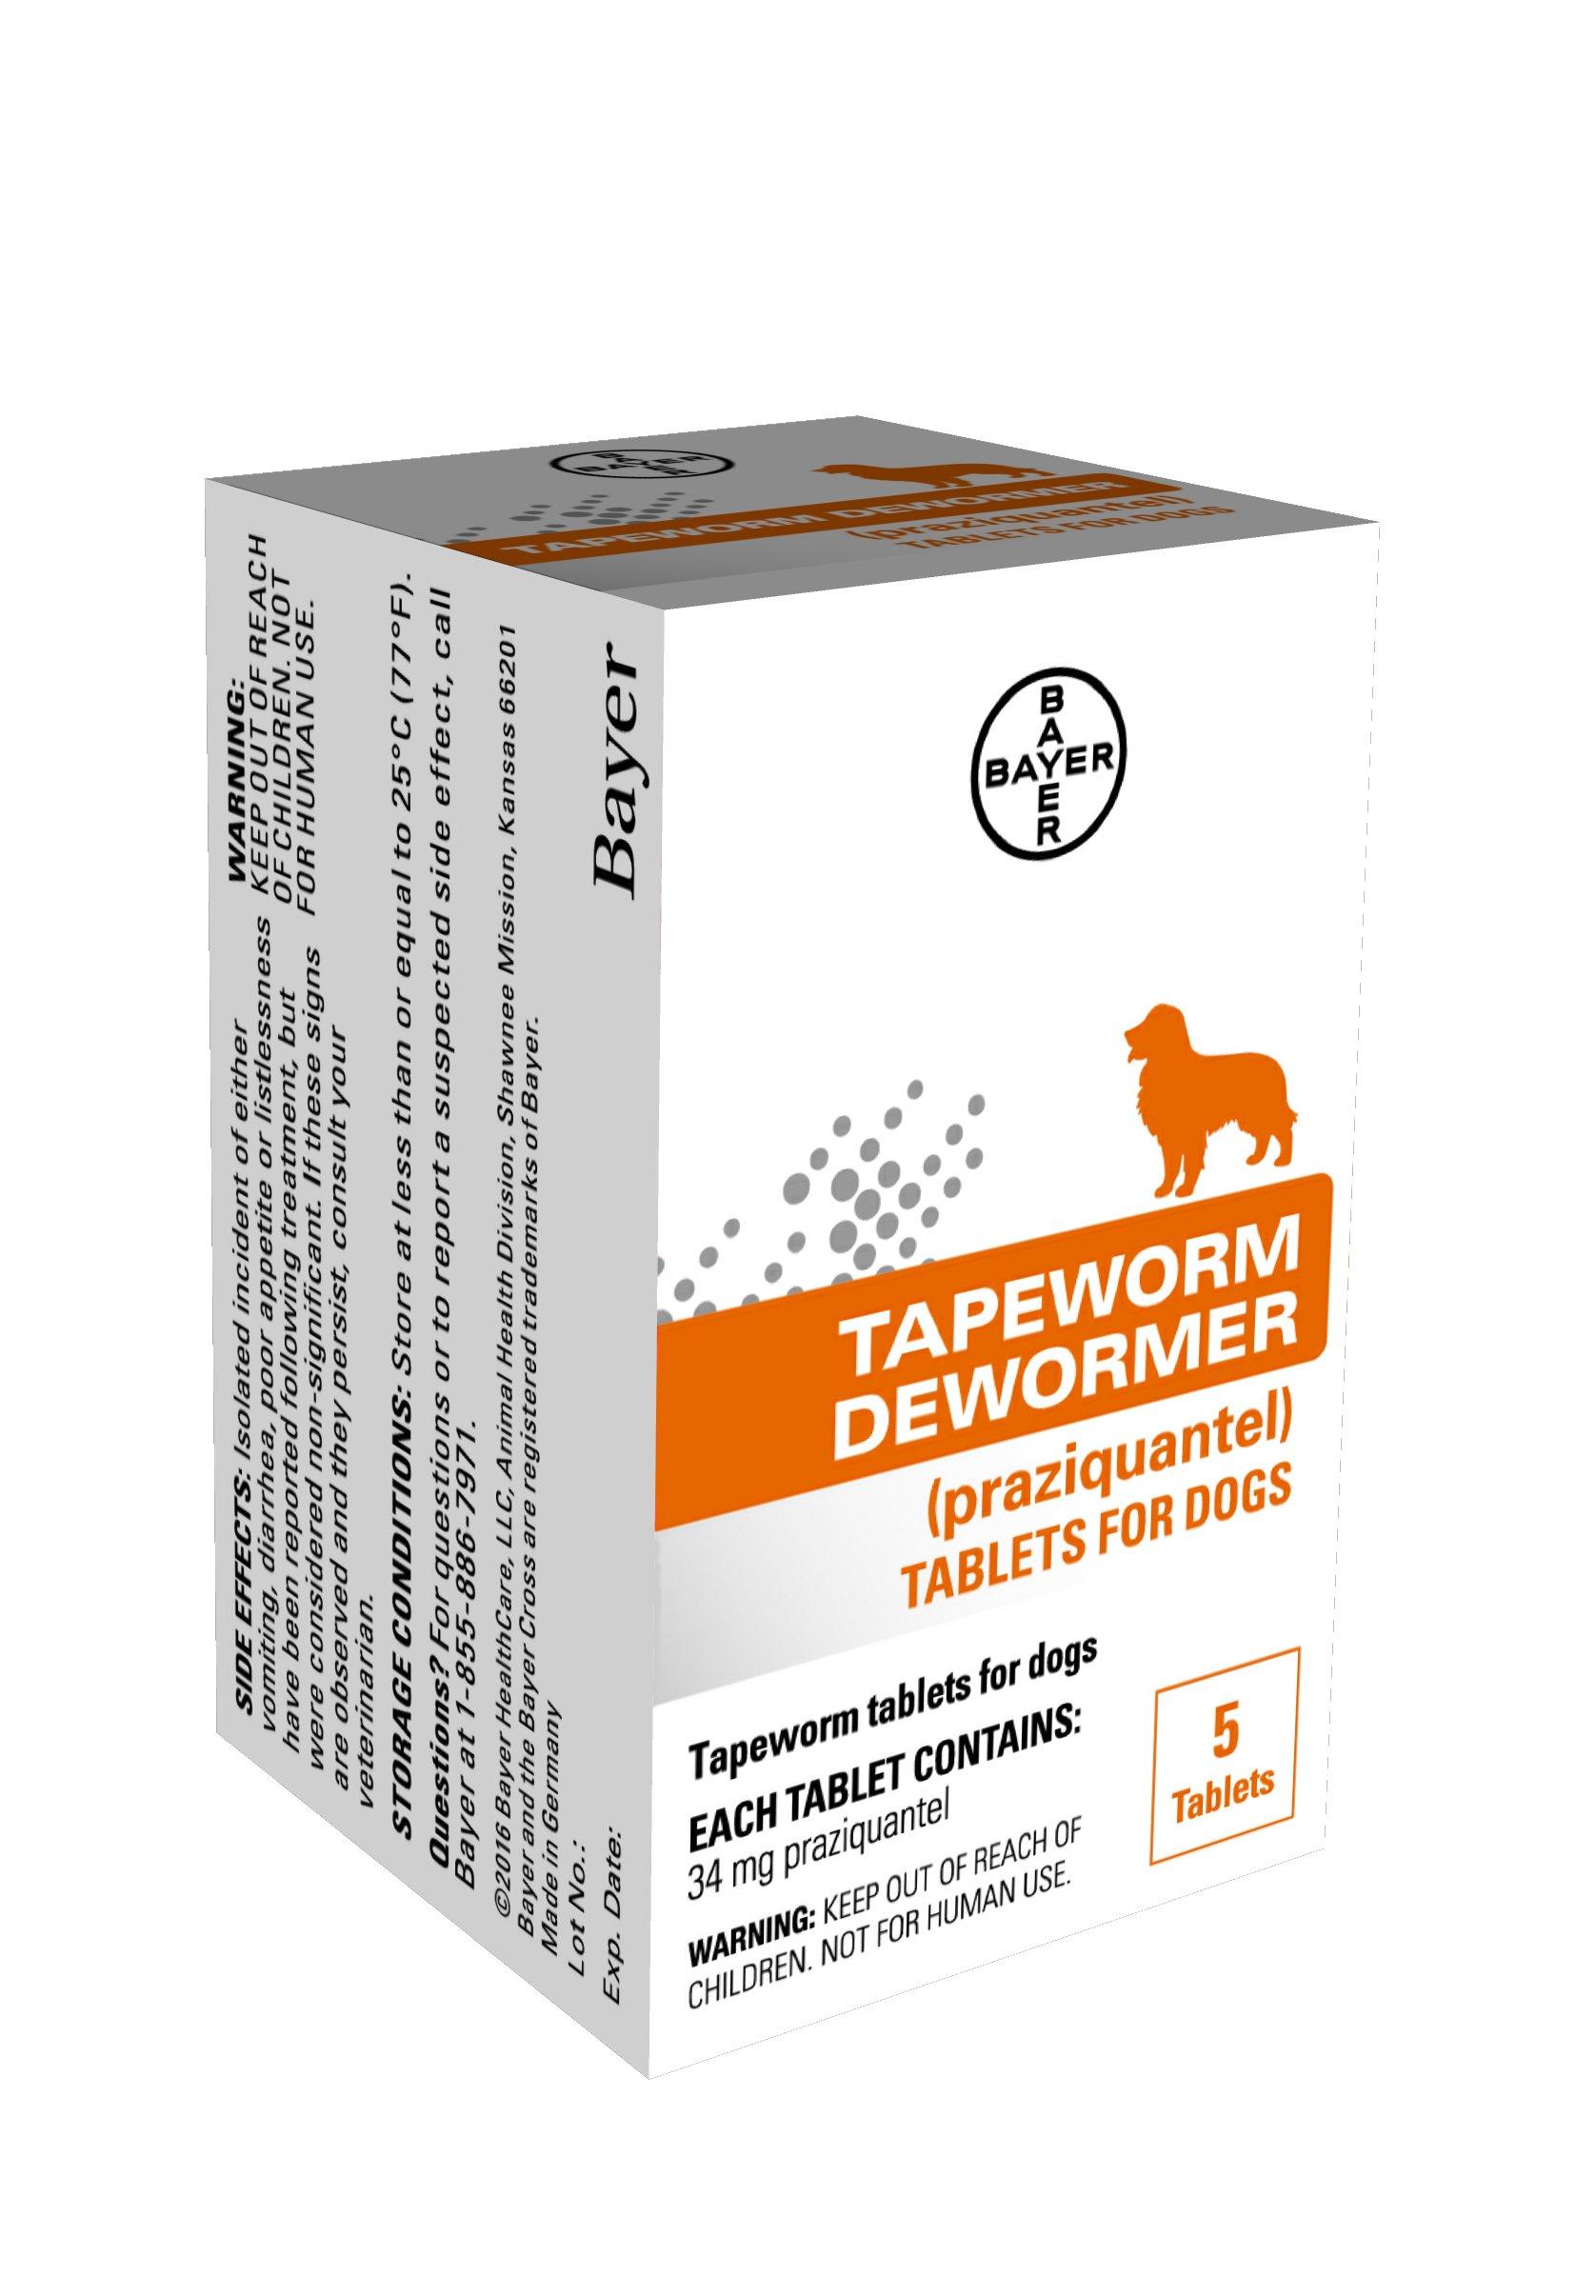 Bayer Tapeworm Dewormer for Dogs, 4 weeks and older